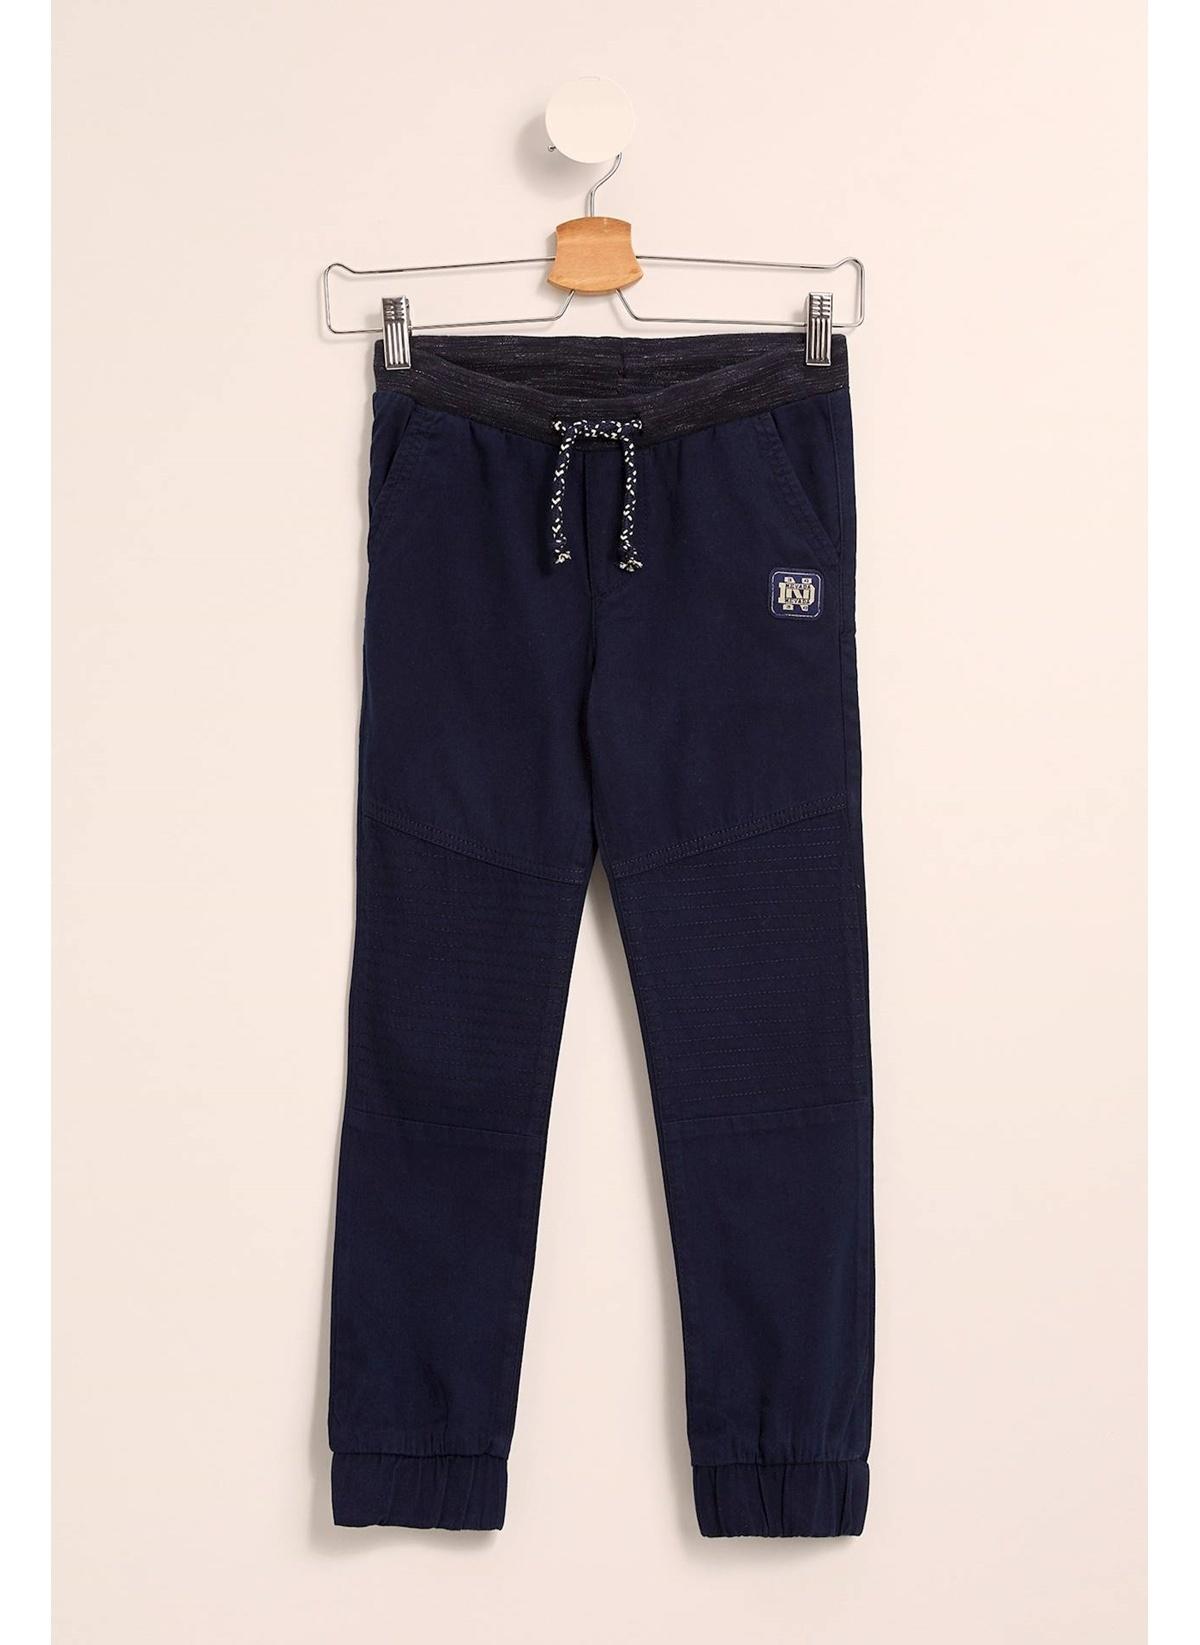 Defacto Pantolon K2382a619spnm26 Lastikli Paçalı Slim Fit – 59.99 TL